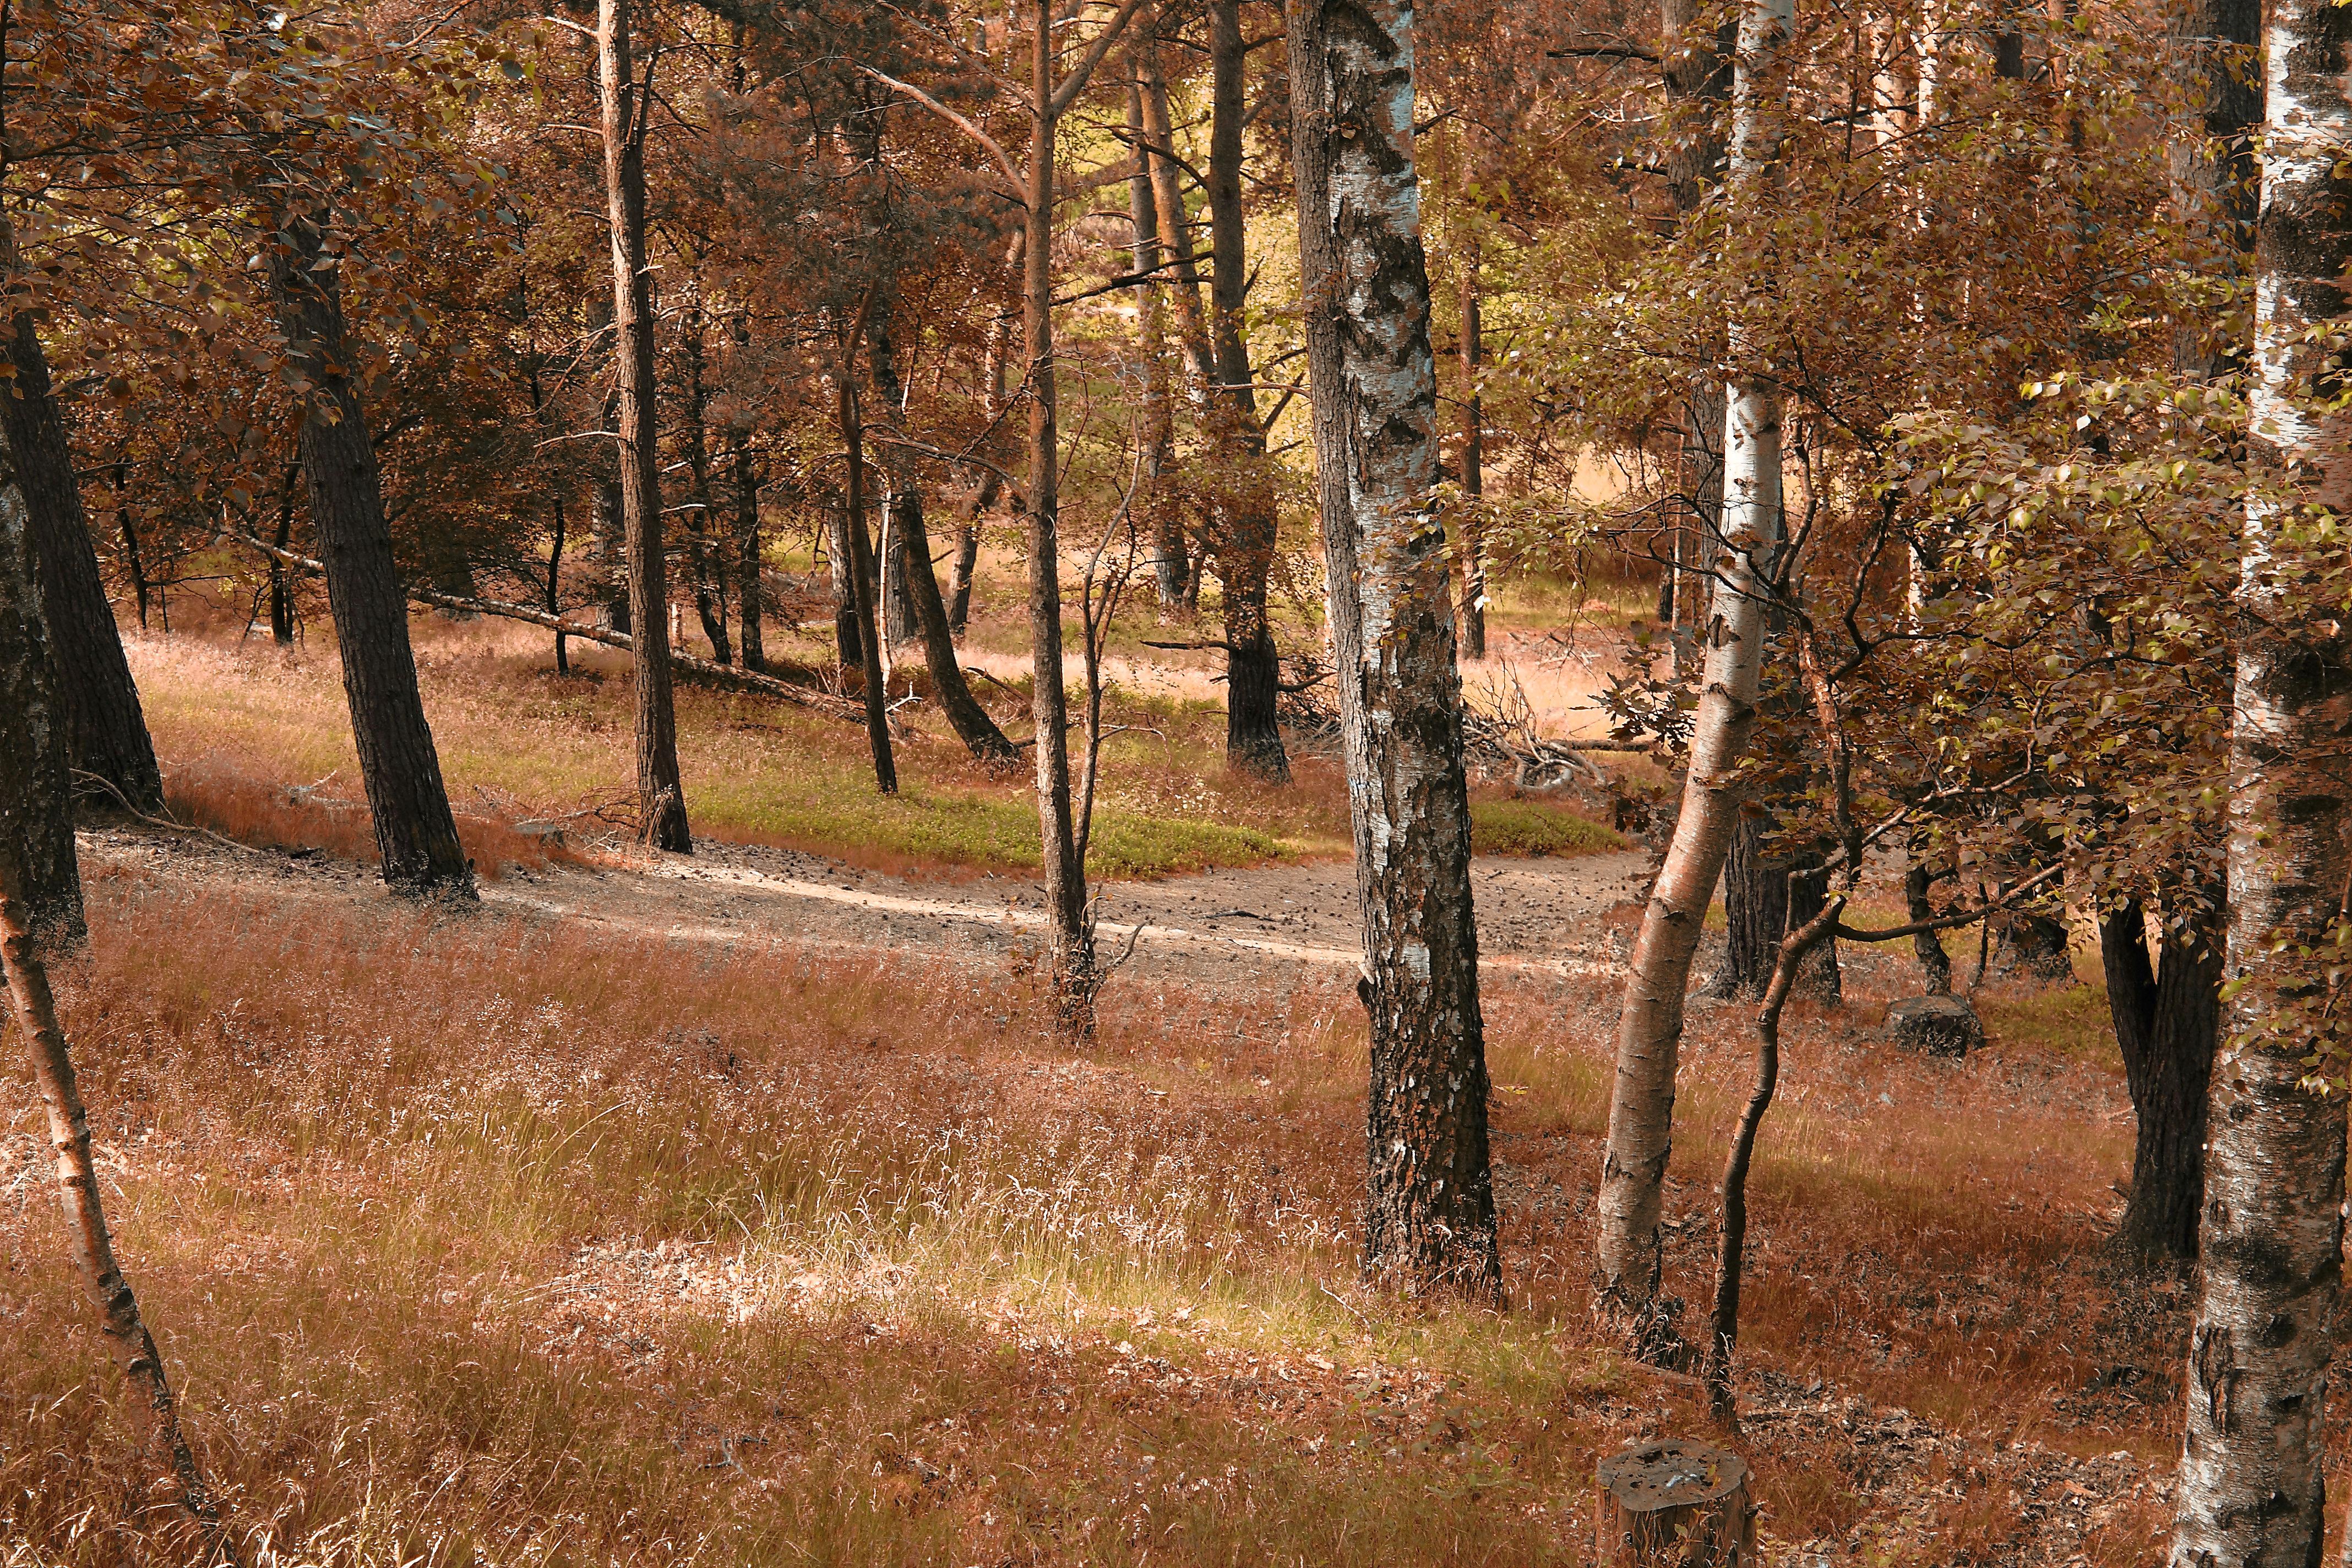 Autumn Forest, Autumn, Forest, Plants, Seasonal, HQ Photo